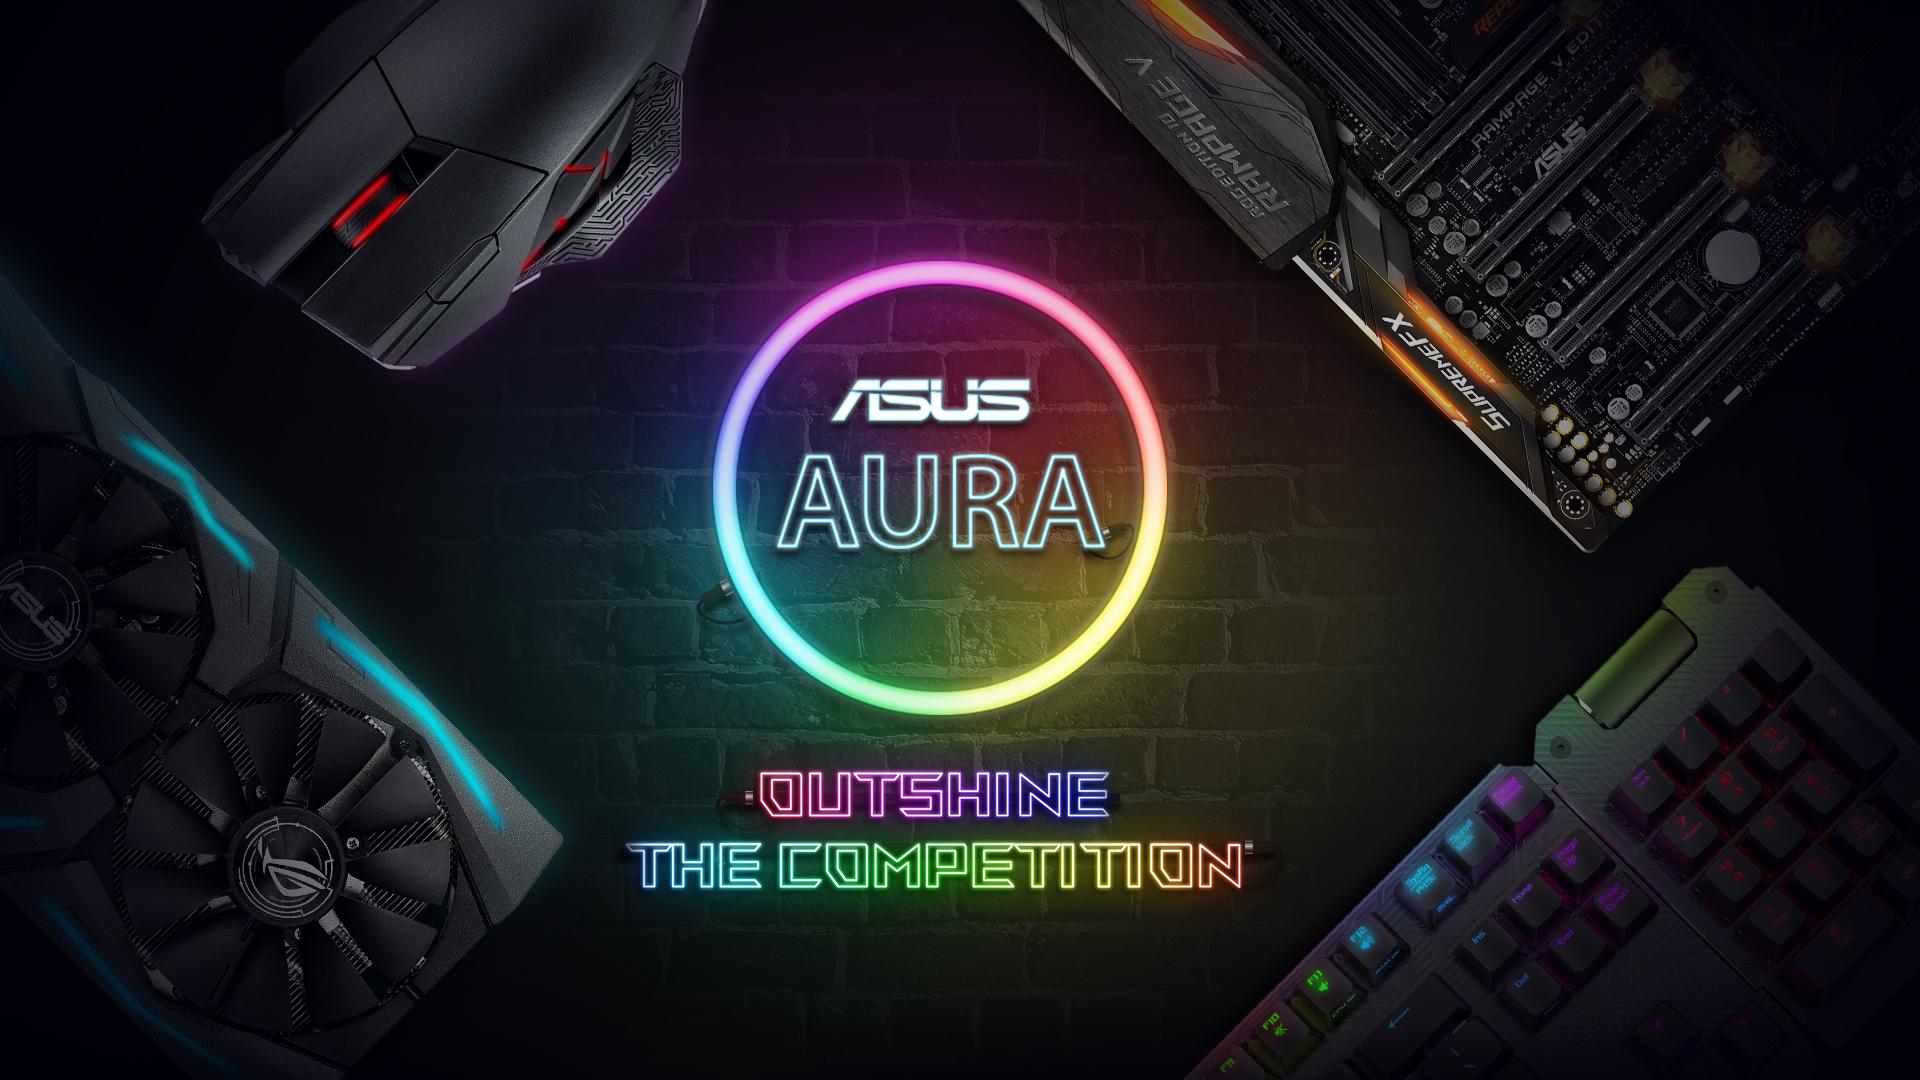 asus aura 中文 版